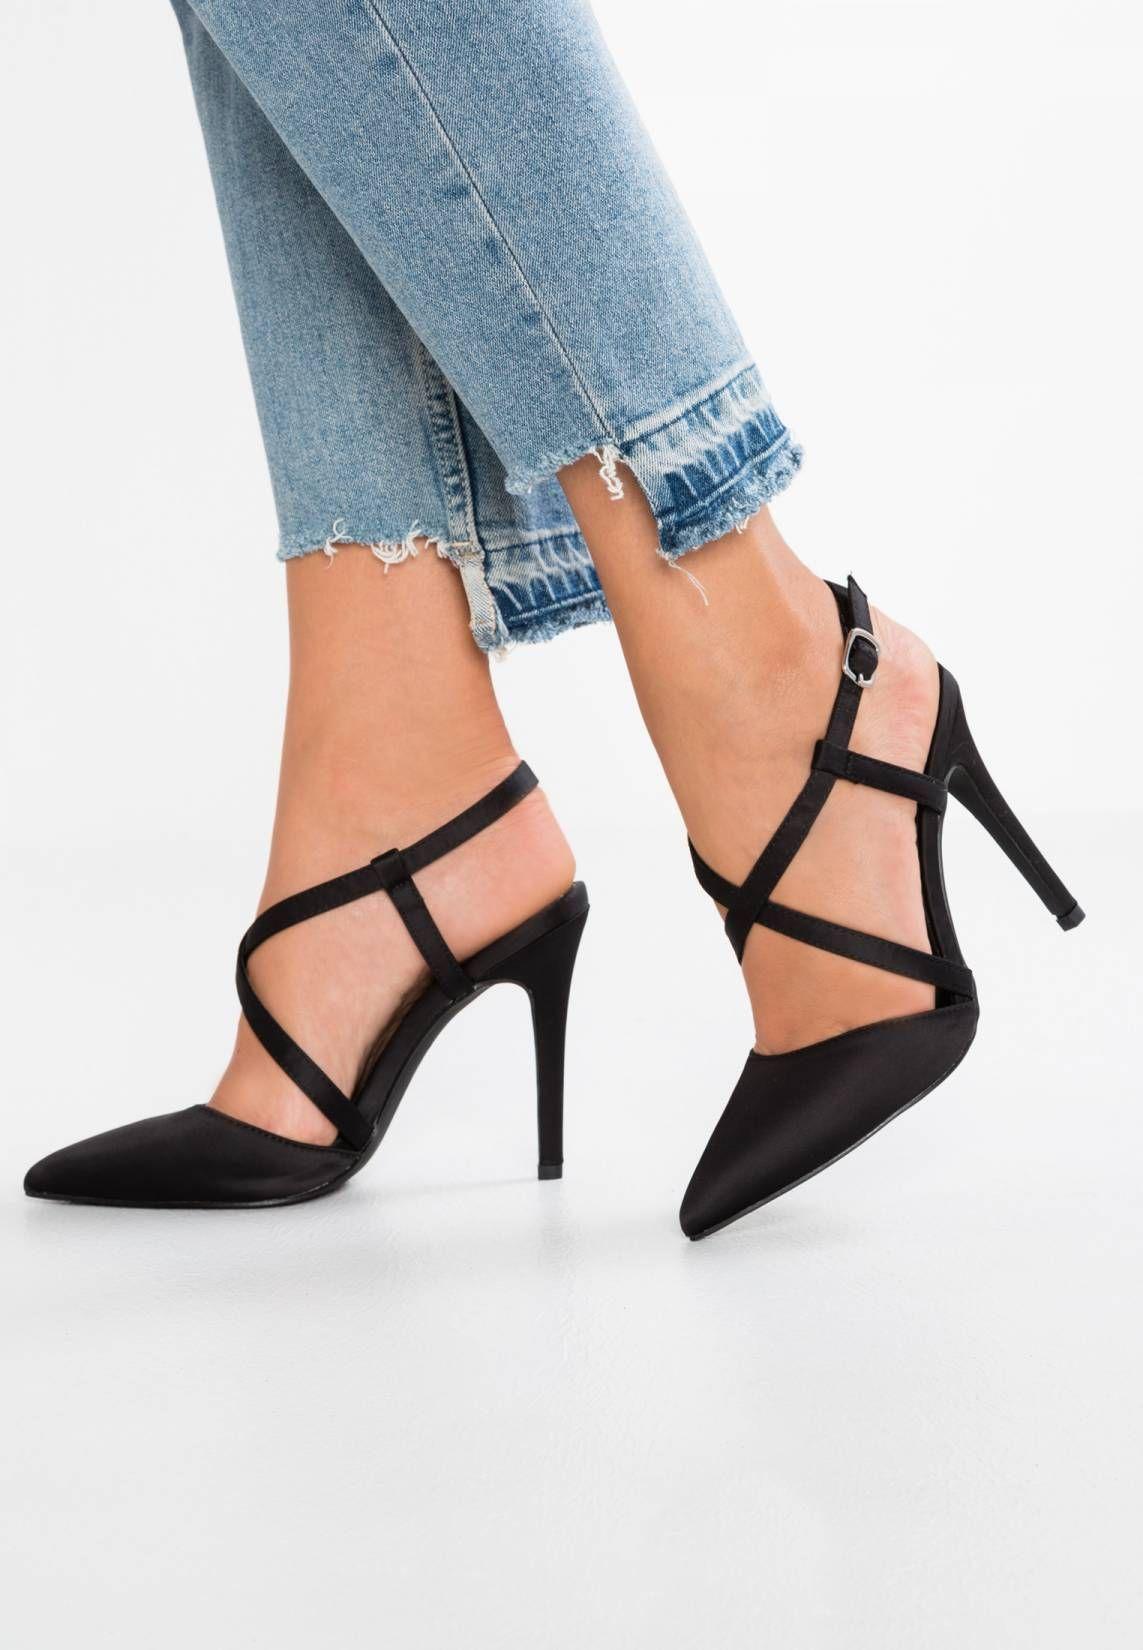 Zapatos azules con elástico románticos Anna Field para mujer RwOCZ